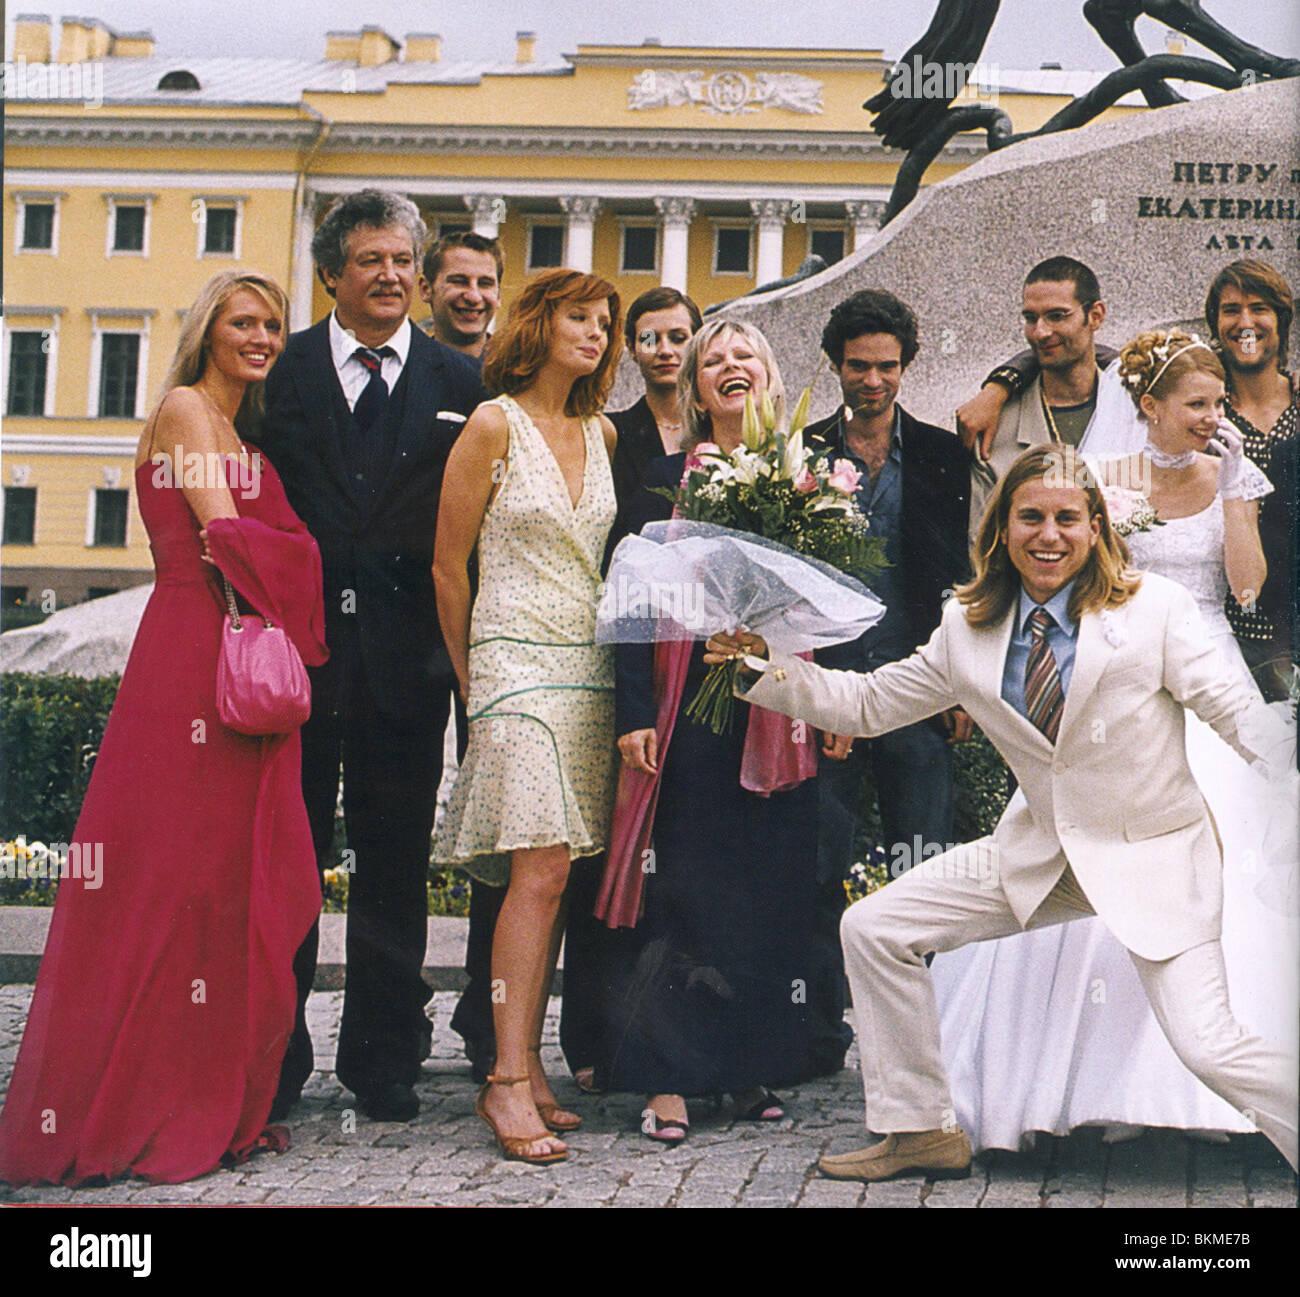 L'AUBERGE ESPAGNOLE (2002) POT LUCK (ALT) AUBE 001-25 - Stock Image